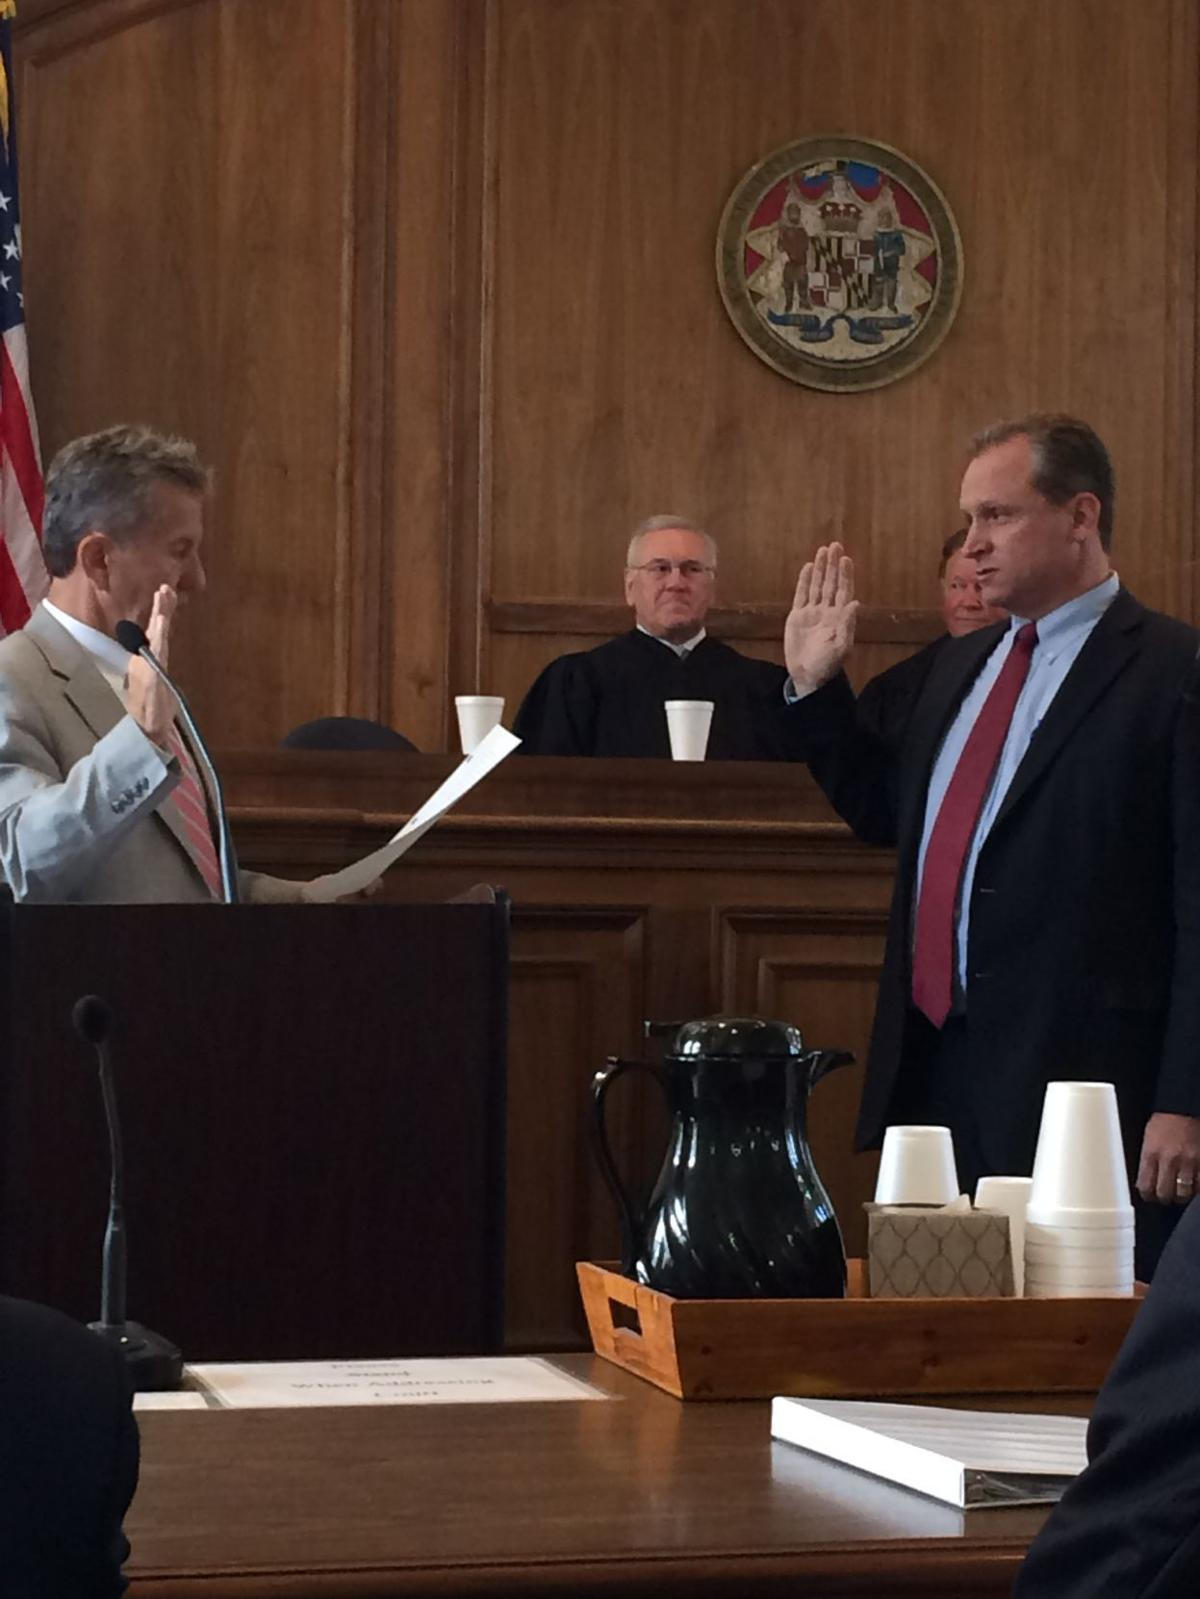 Newell sworn in as Caroline circuit court judge | Local